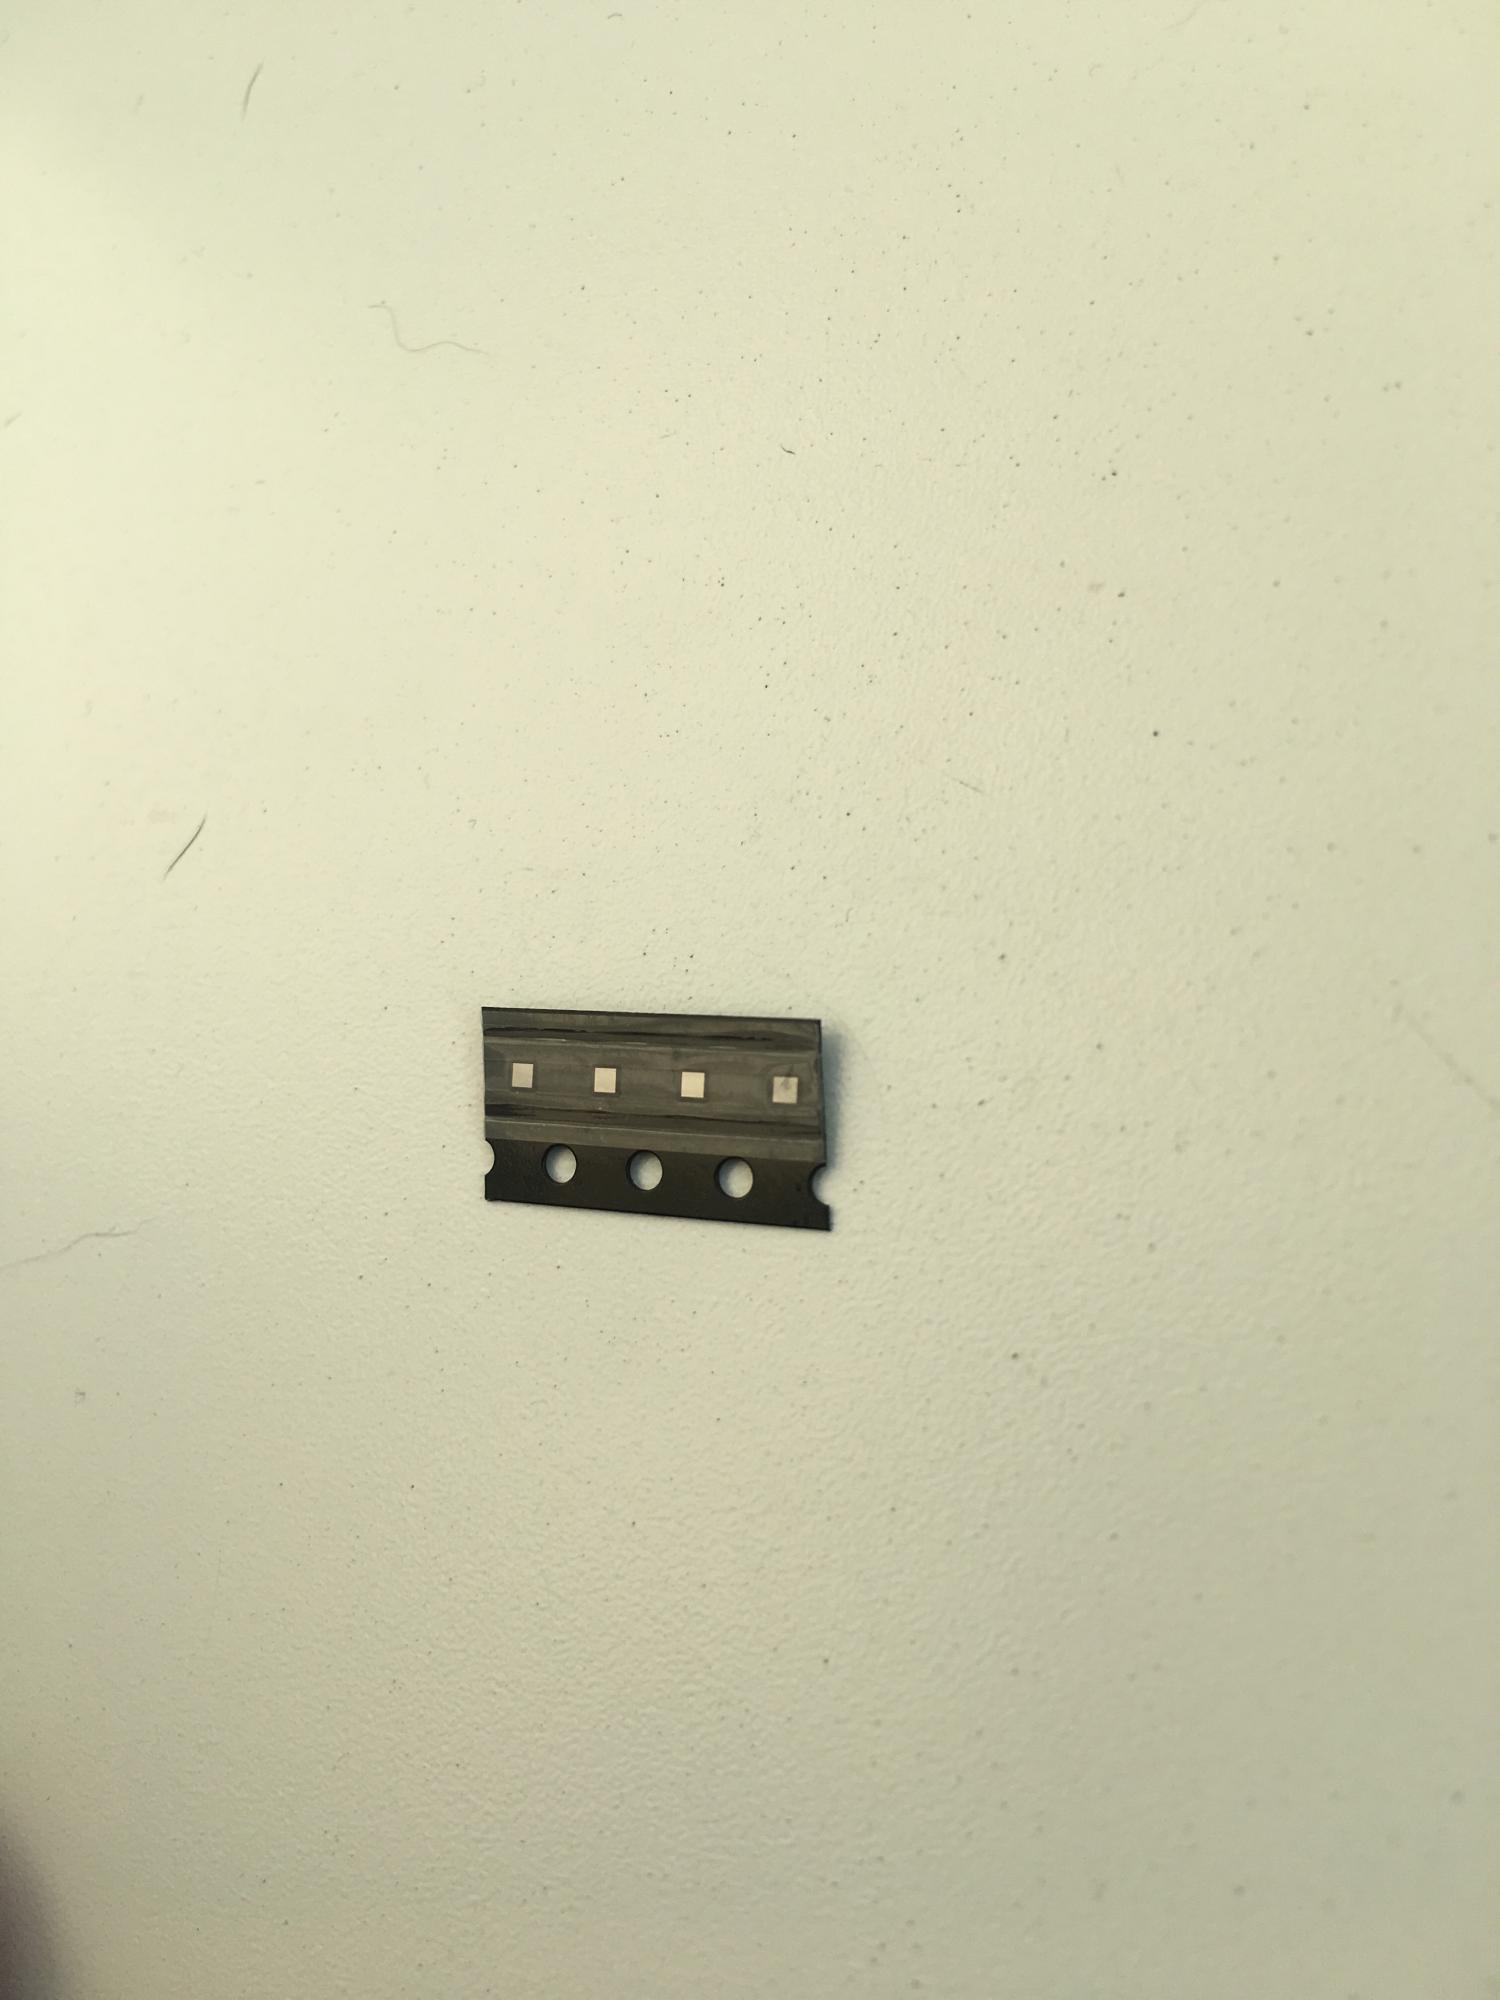 Q2 микросхема. IC транзистор зарядки